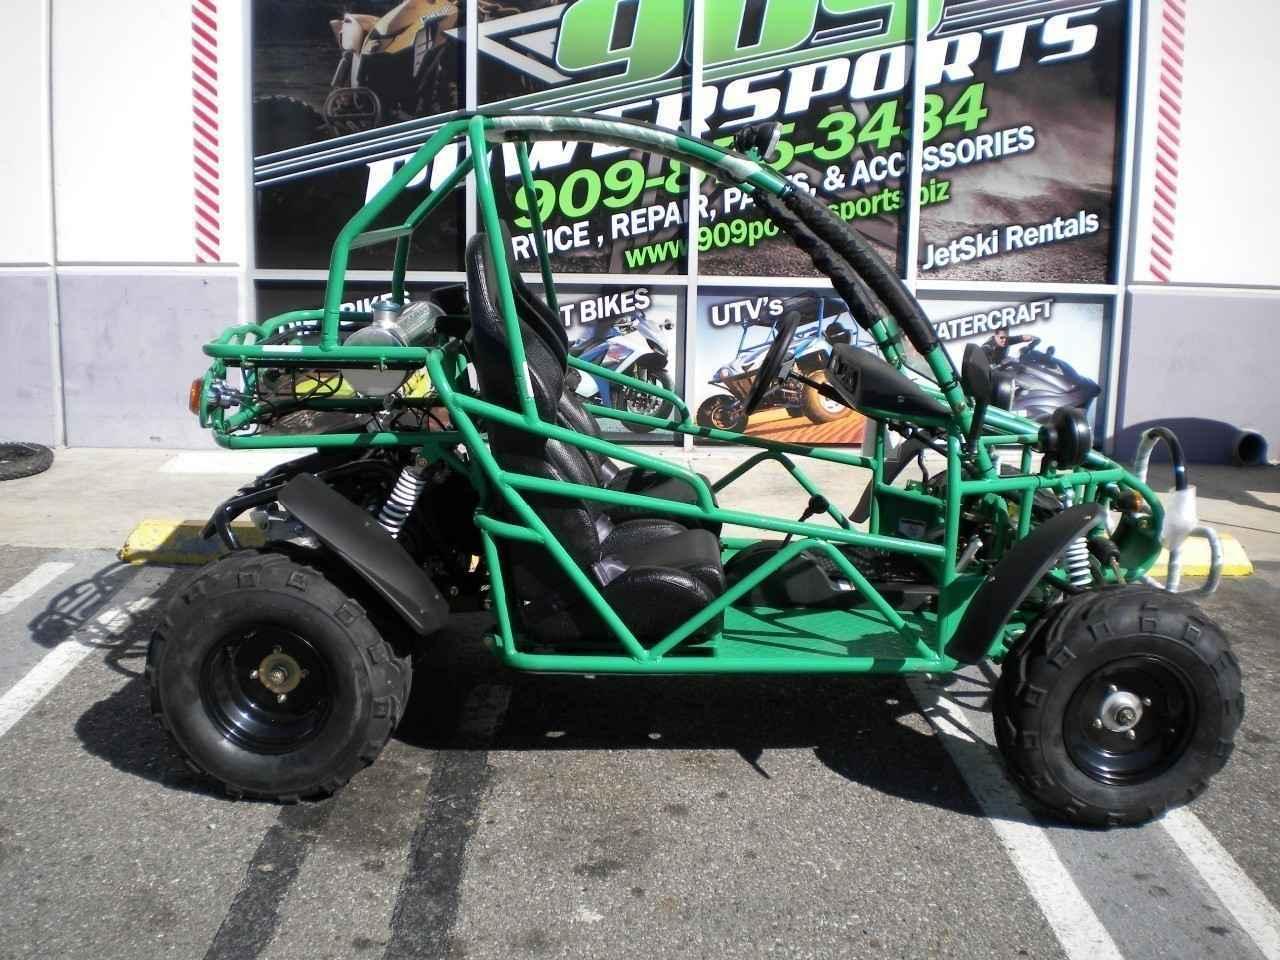 New 2015 BMS Sand Sniper 150 ATVs For Sale in California on atvtrades com